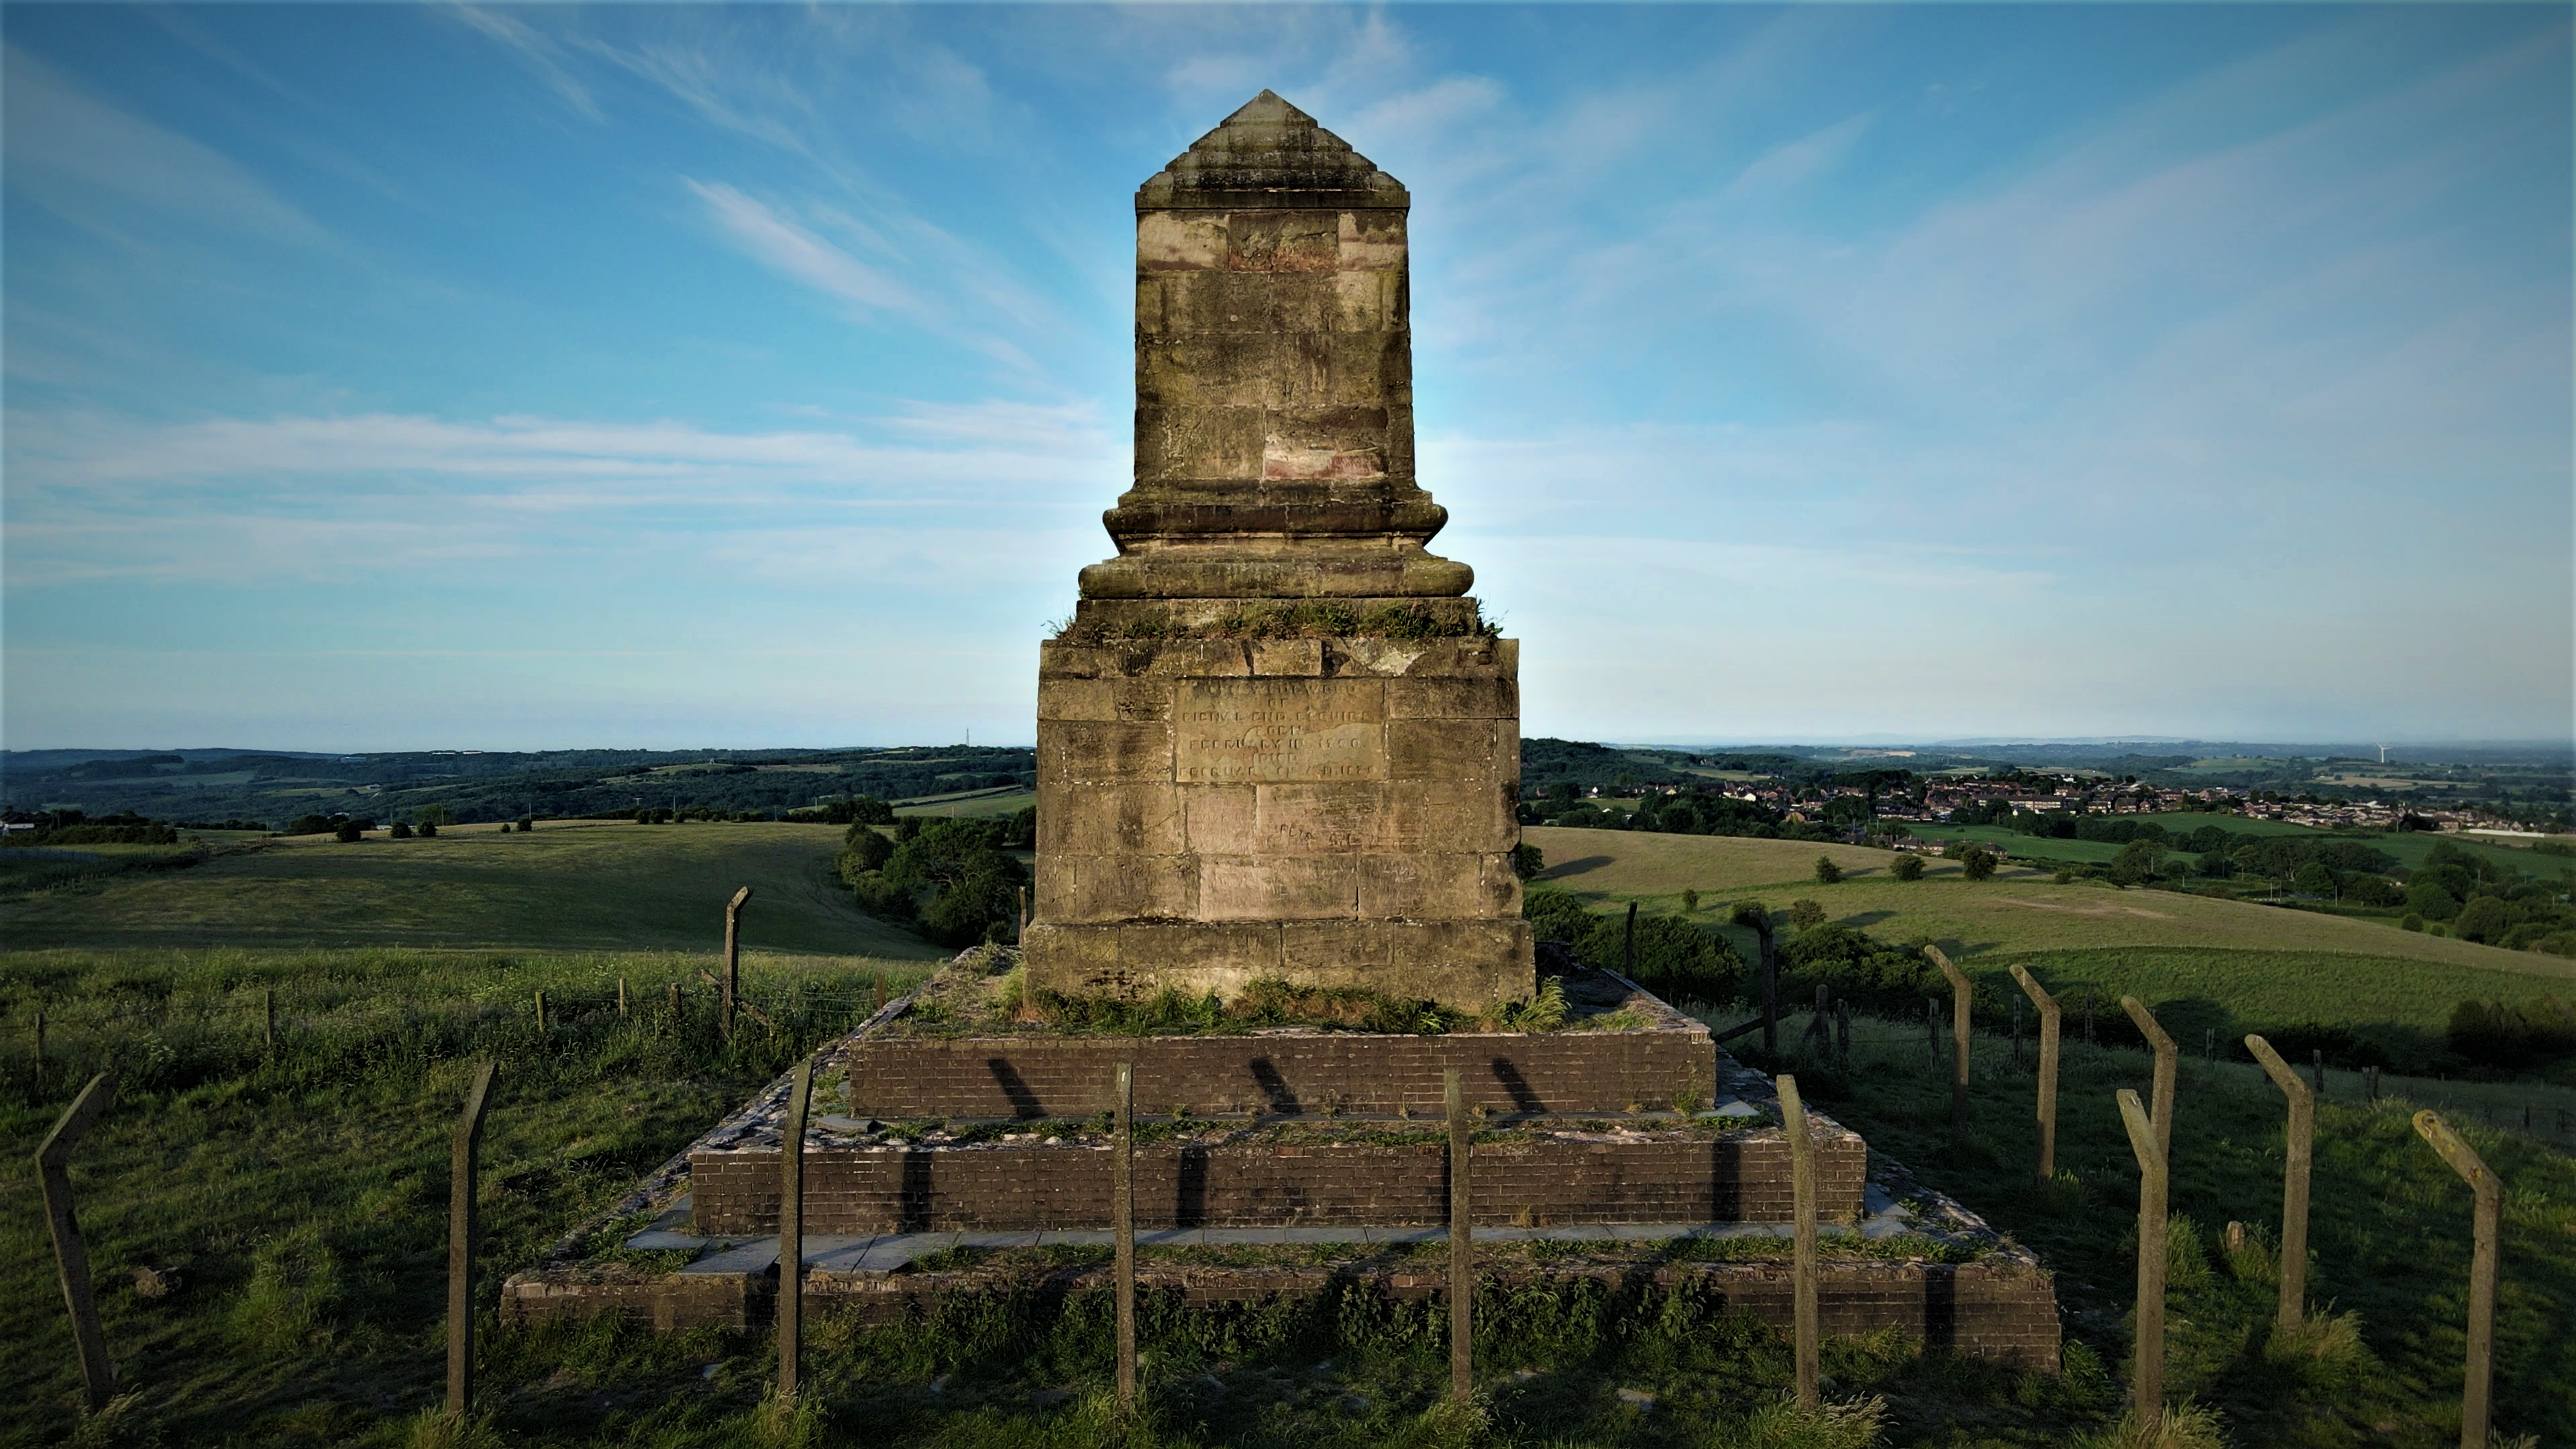 JOHN WEDGWOOD MONUMENT